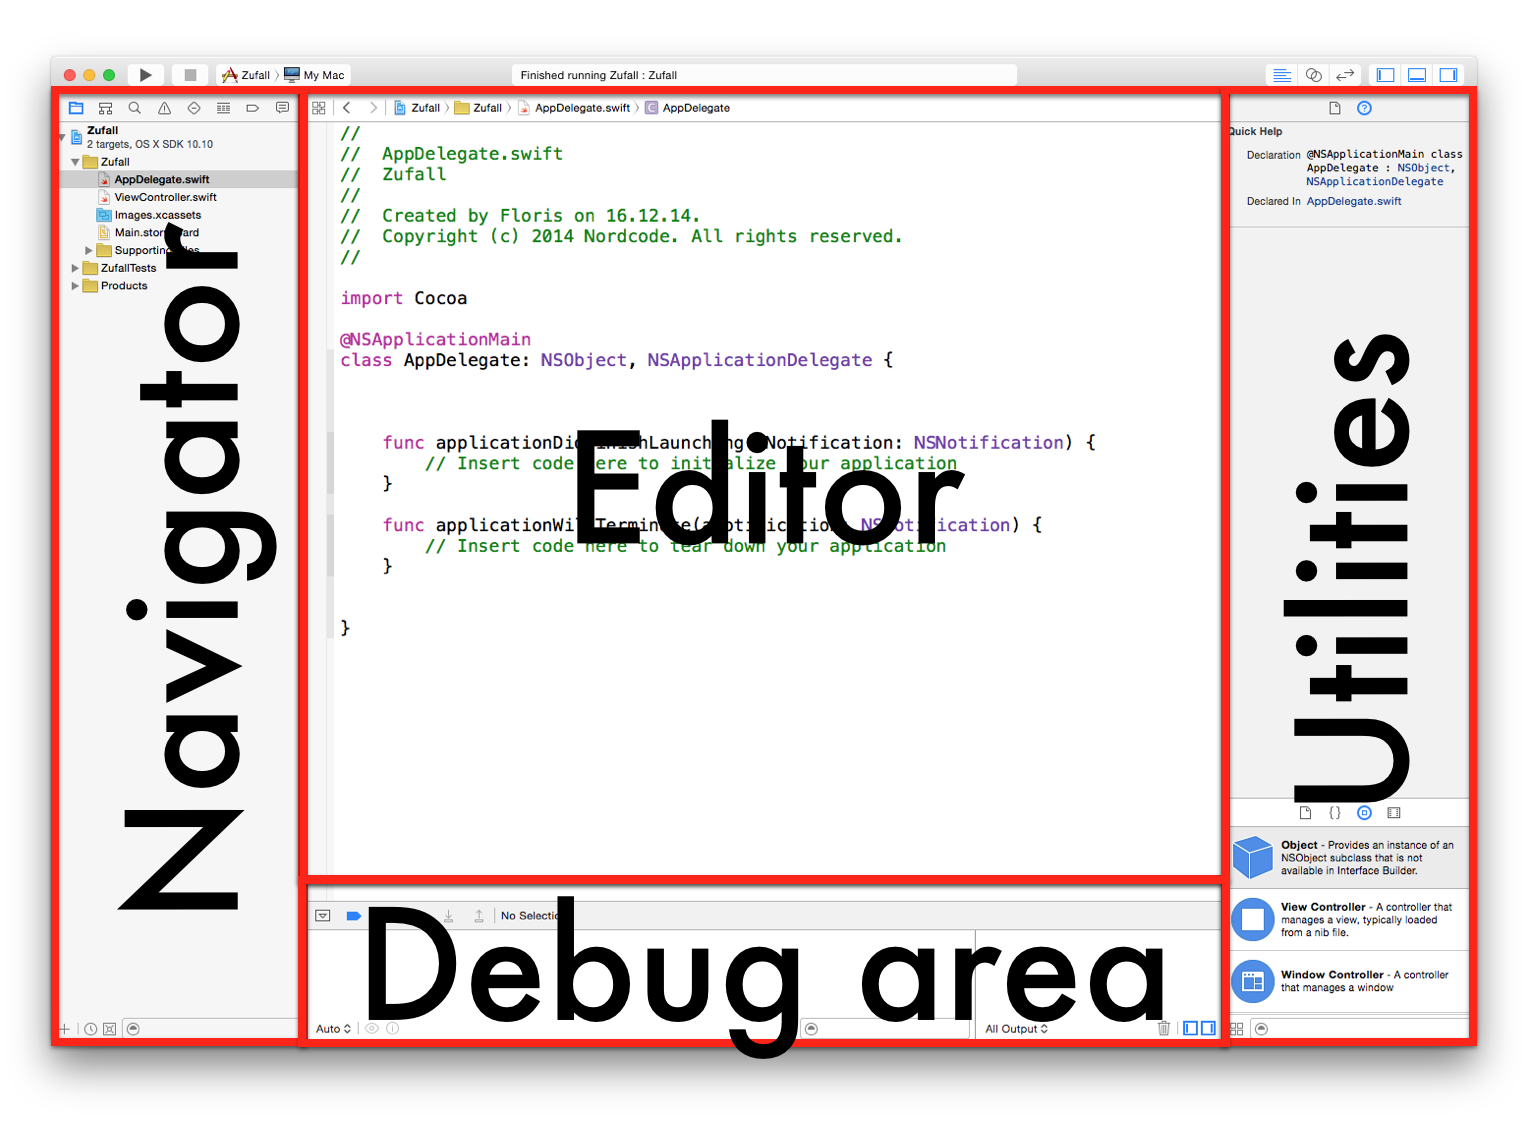 Abbildung 2.1: Das Xcode Fenster